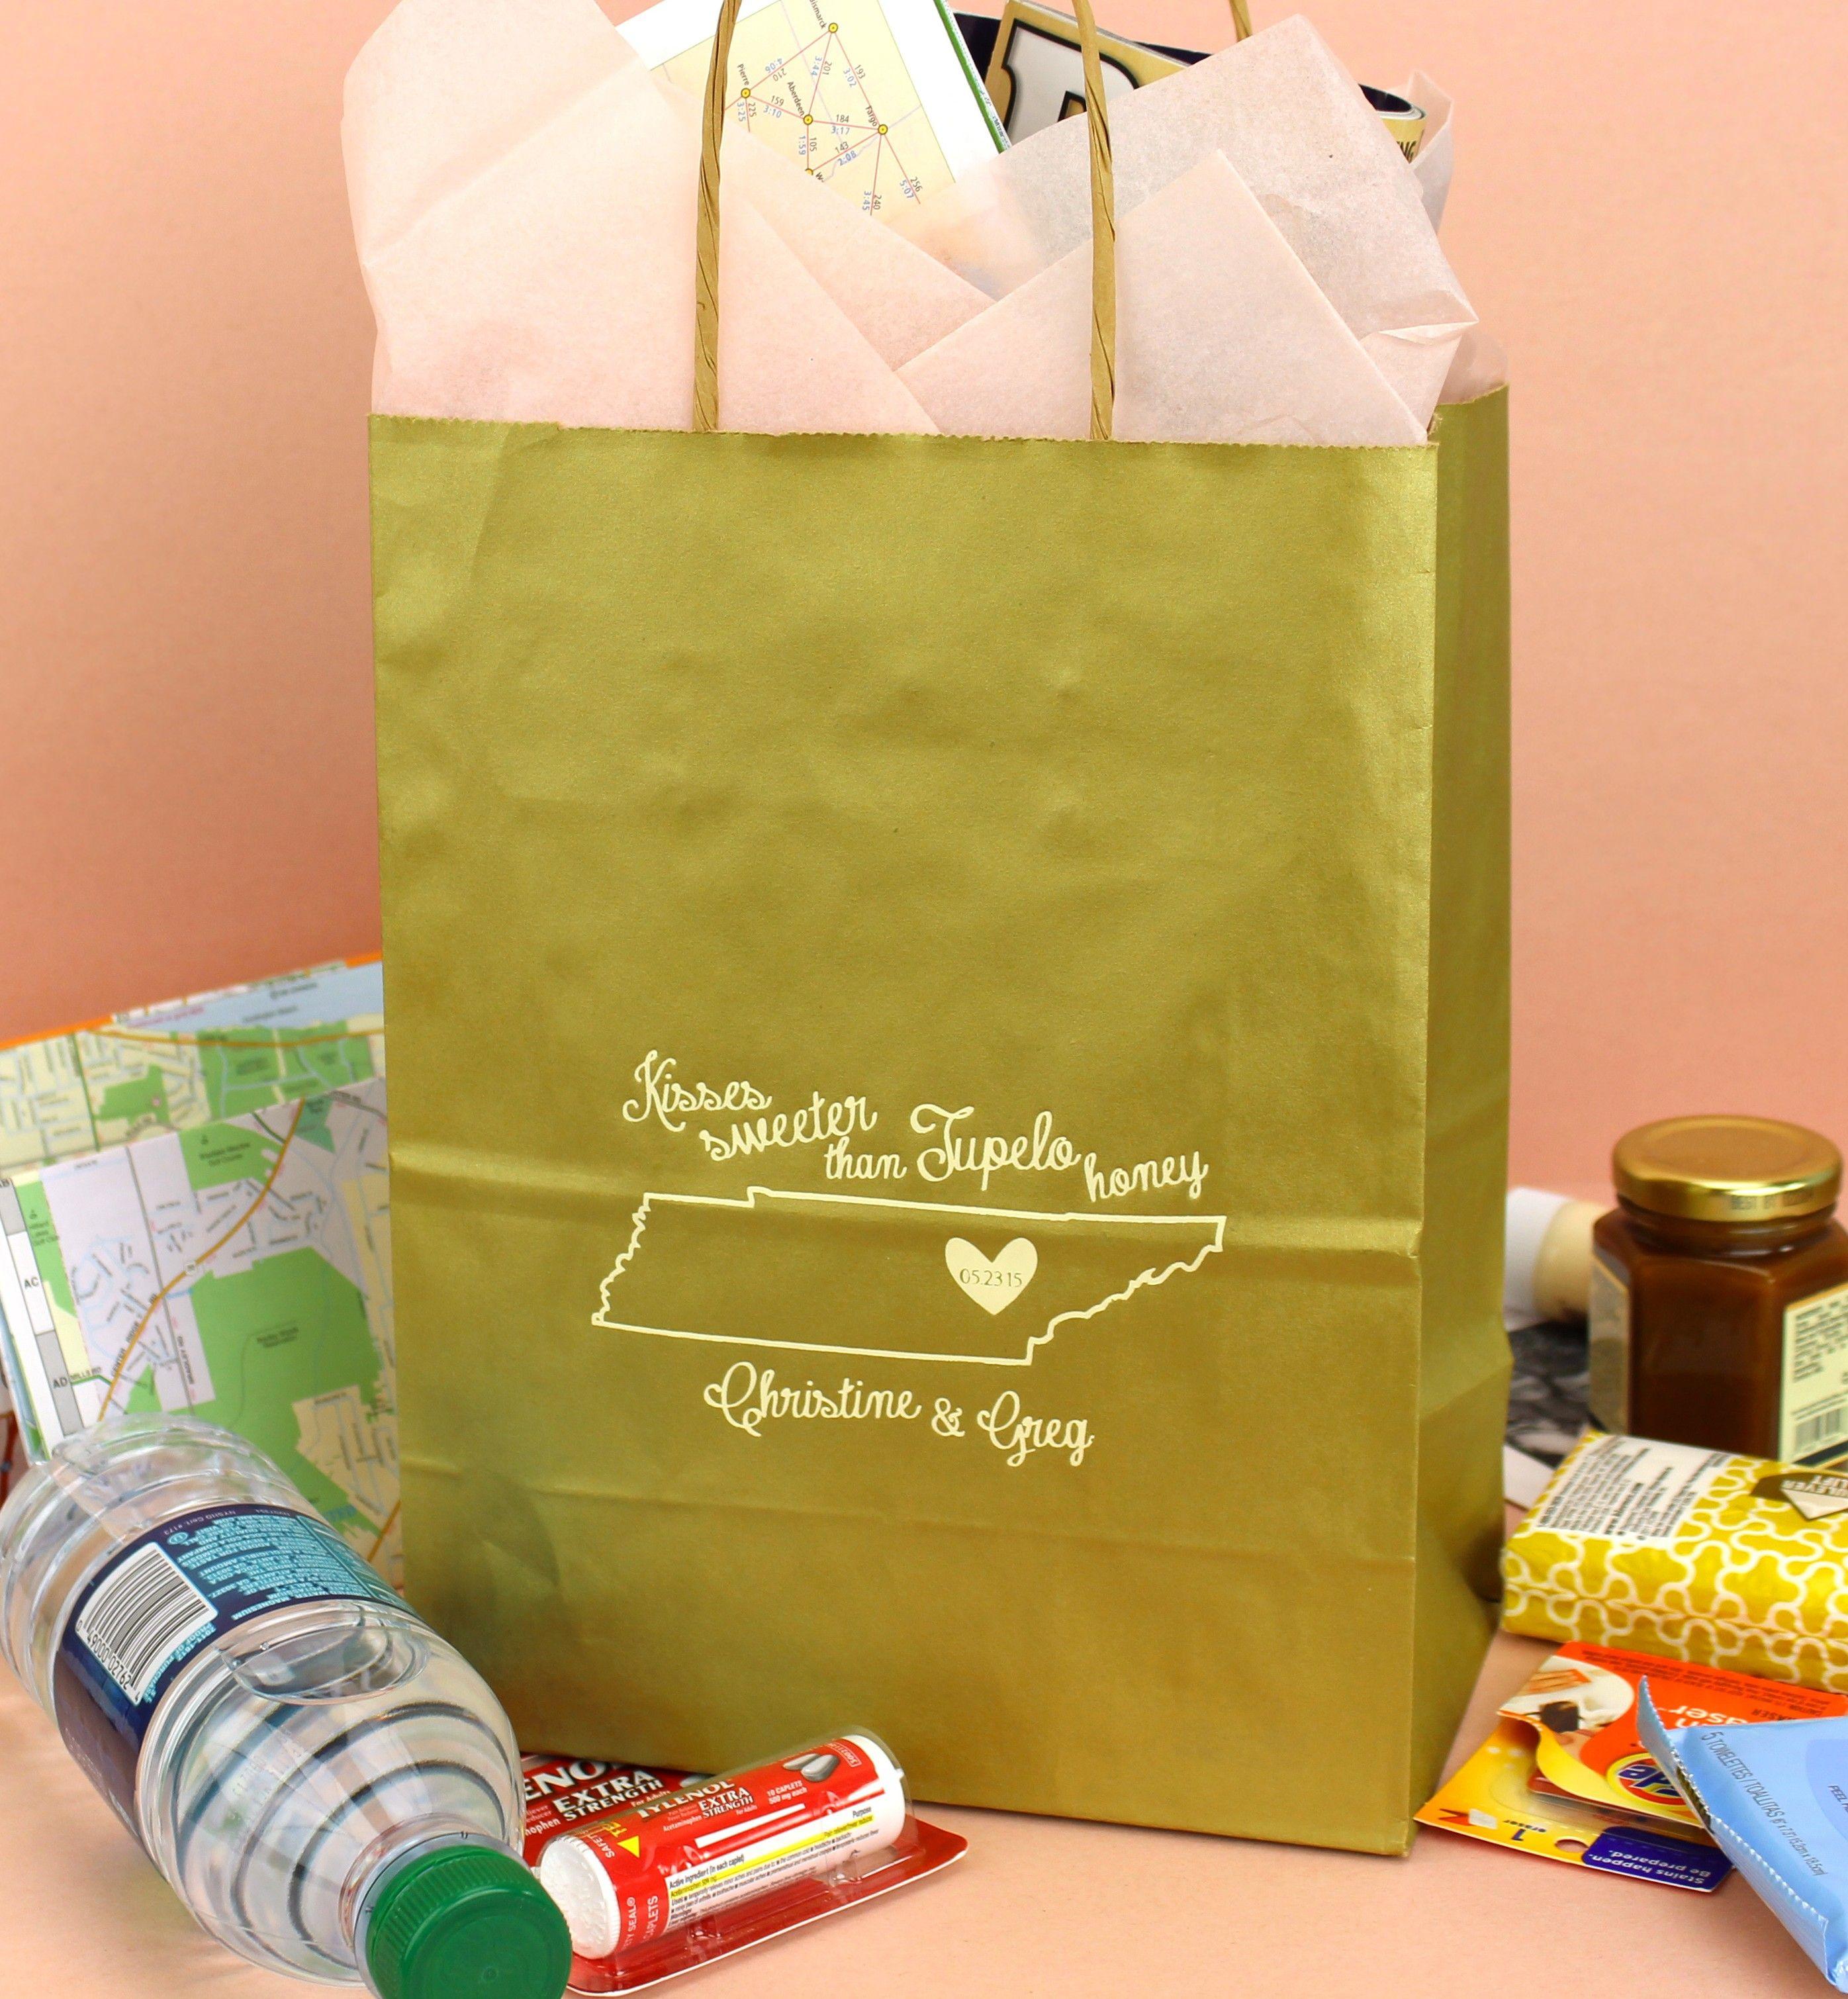 Wedding Welcome Bag Ideas Pinterest : ... Bags on Pinterest Wedding Welcome Bags, Welcome Baskets and Wedding